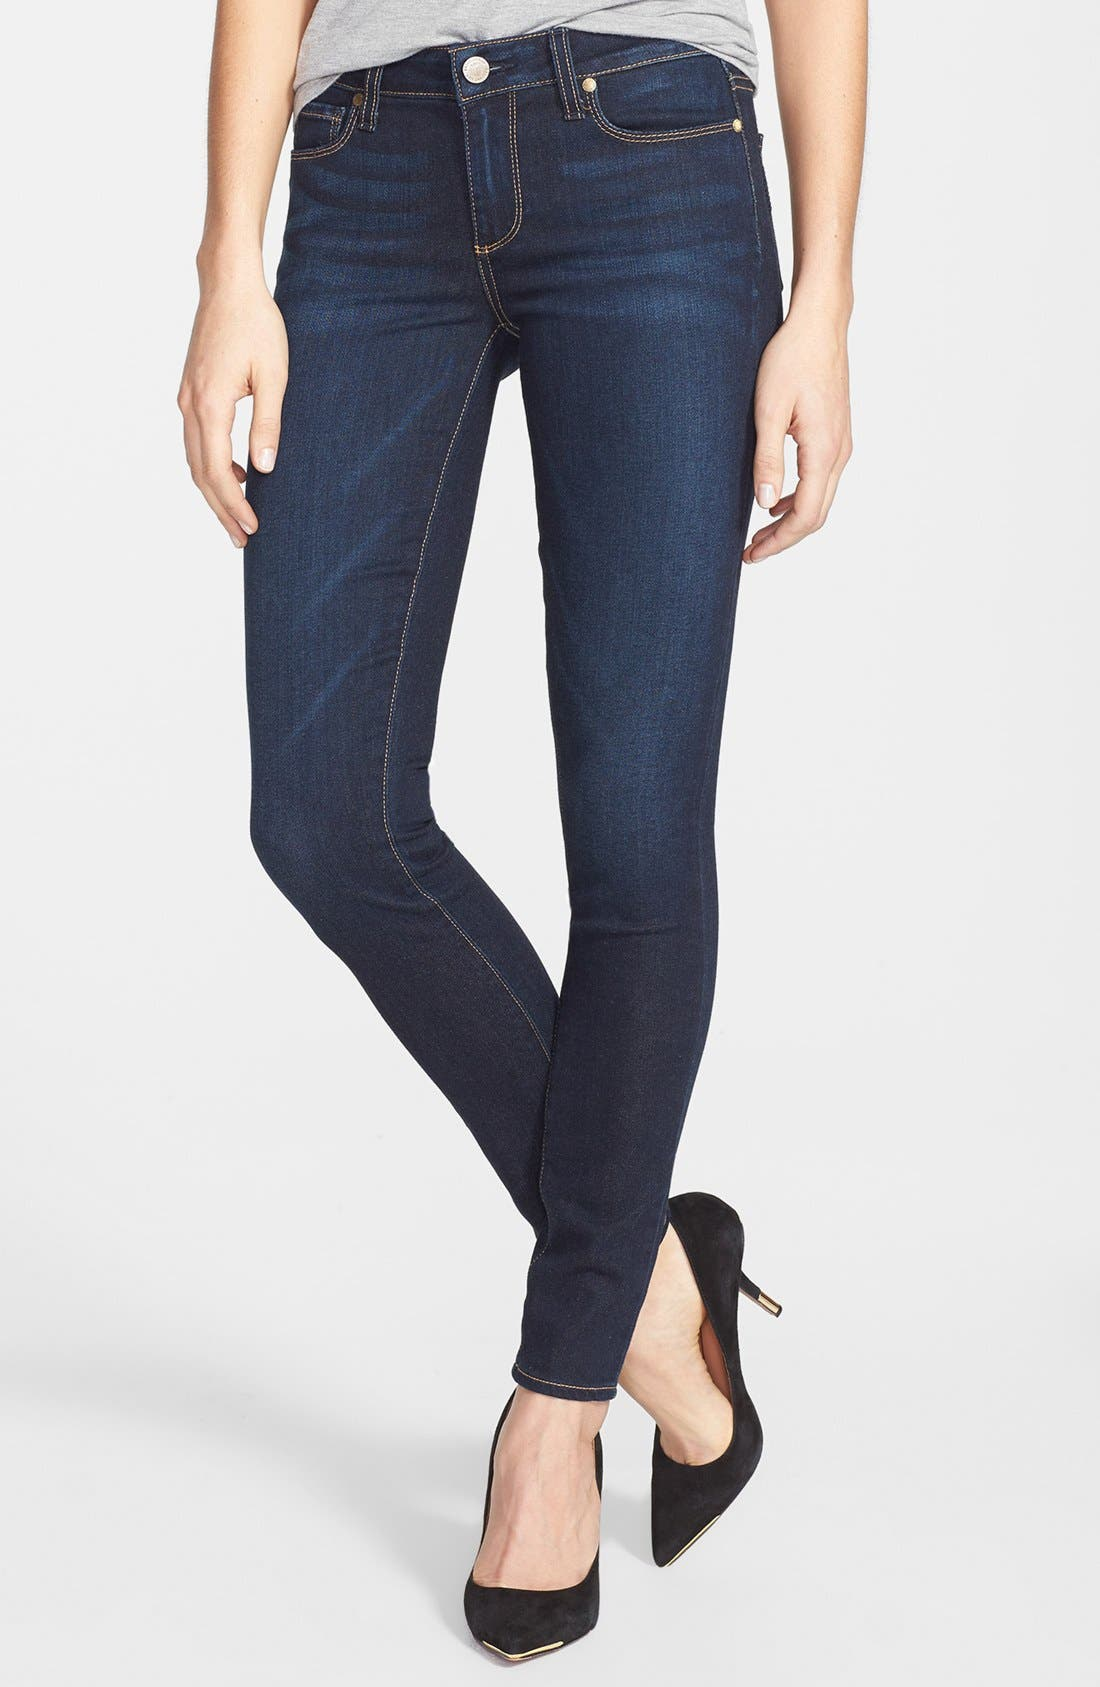 Main Image - Paige Denim 'Verdugo' Ultra Skinny Jeans (Surface)